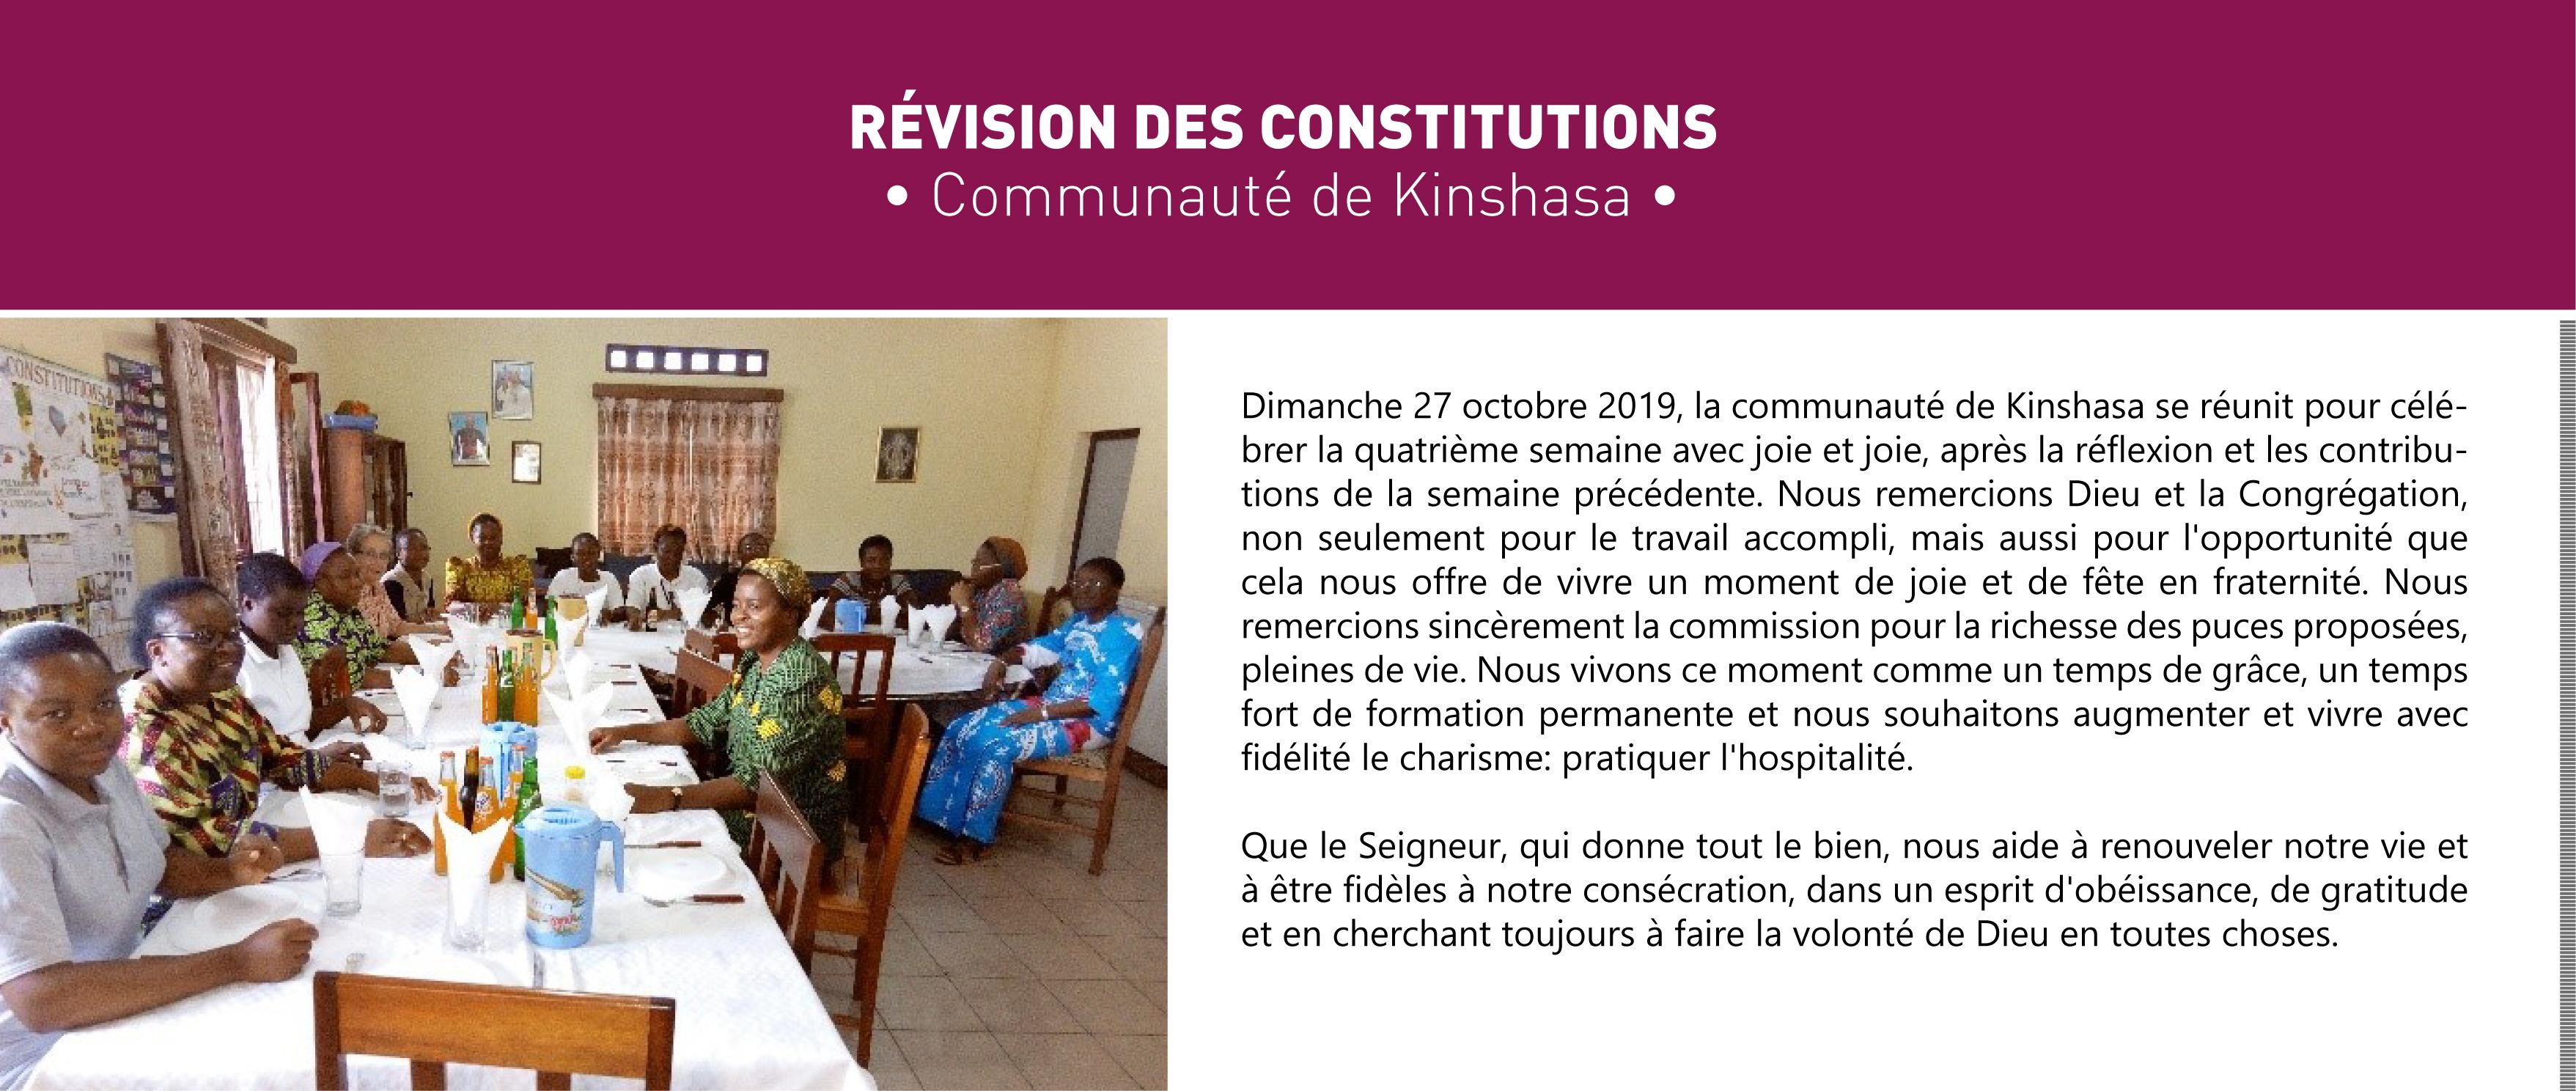 revision-des-constitutions-site-2-02